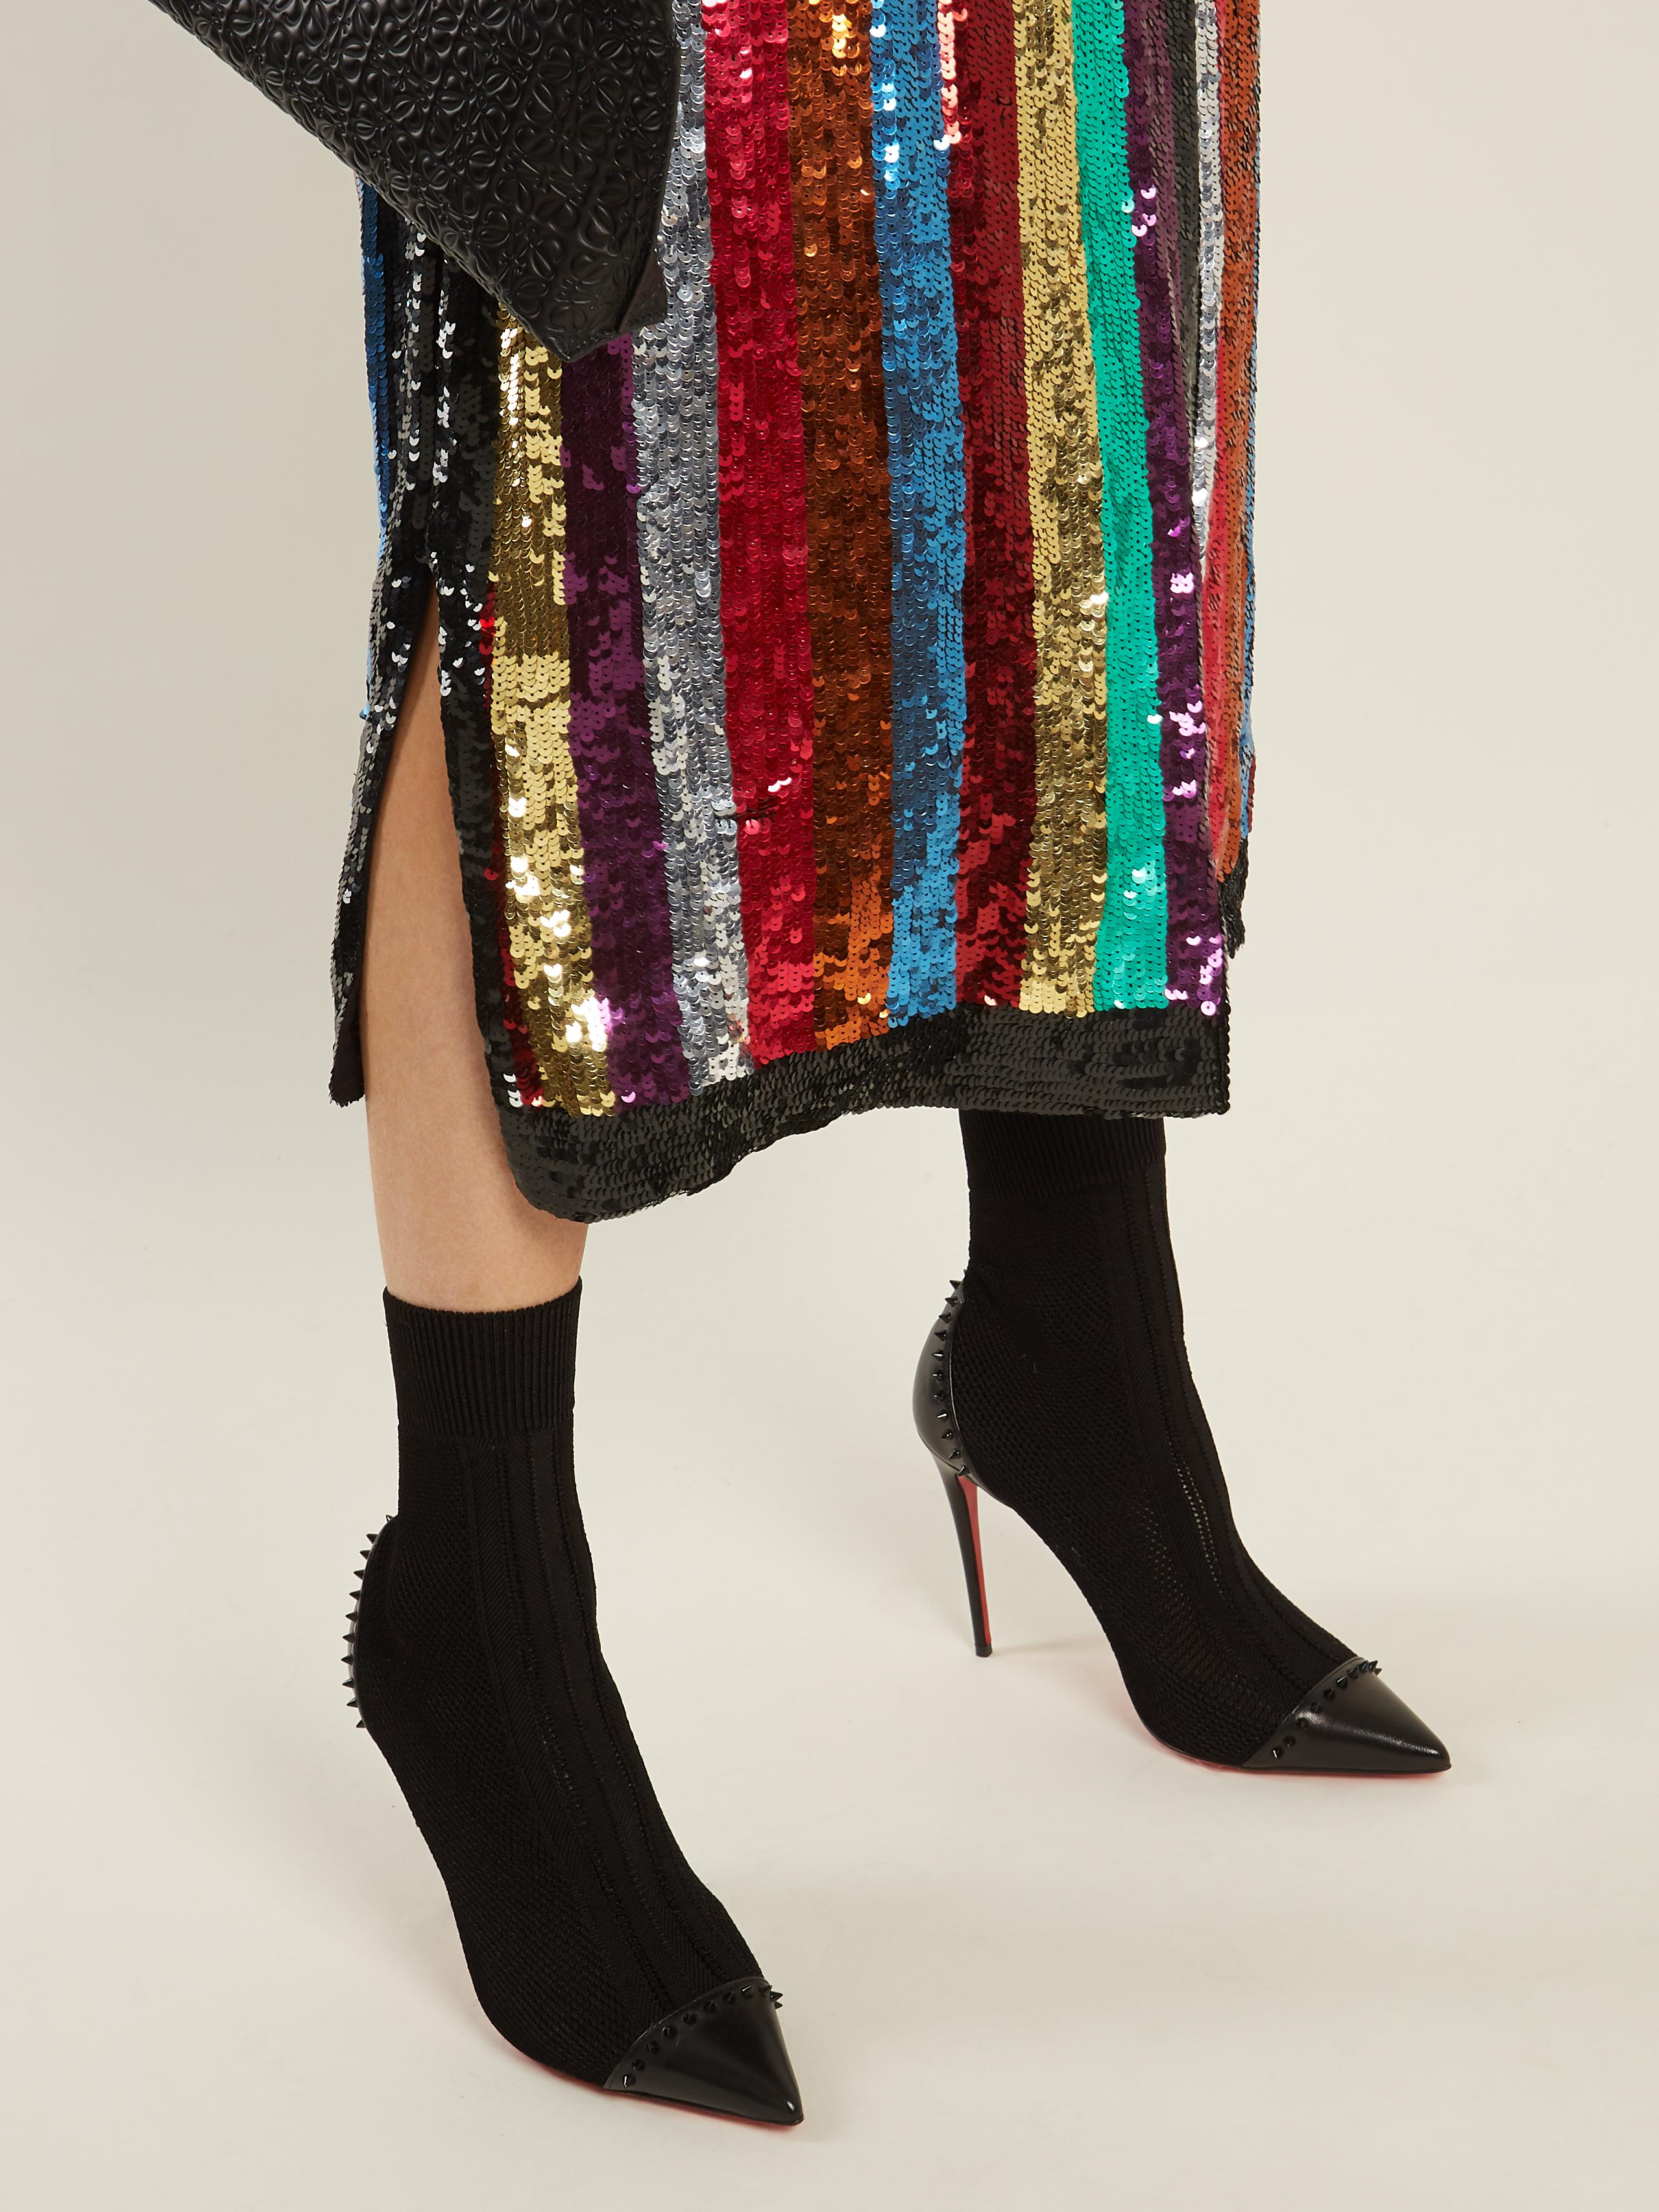 41d31bde54e8 Lyst - Christian Louboutin Dovi Dova Stud-embellished Sock Boots in ...